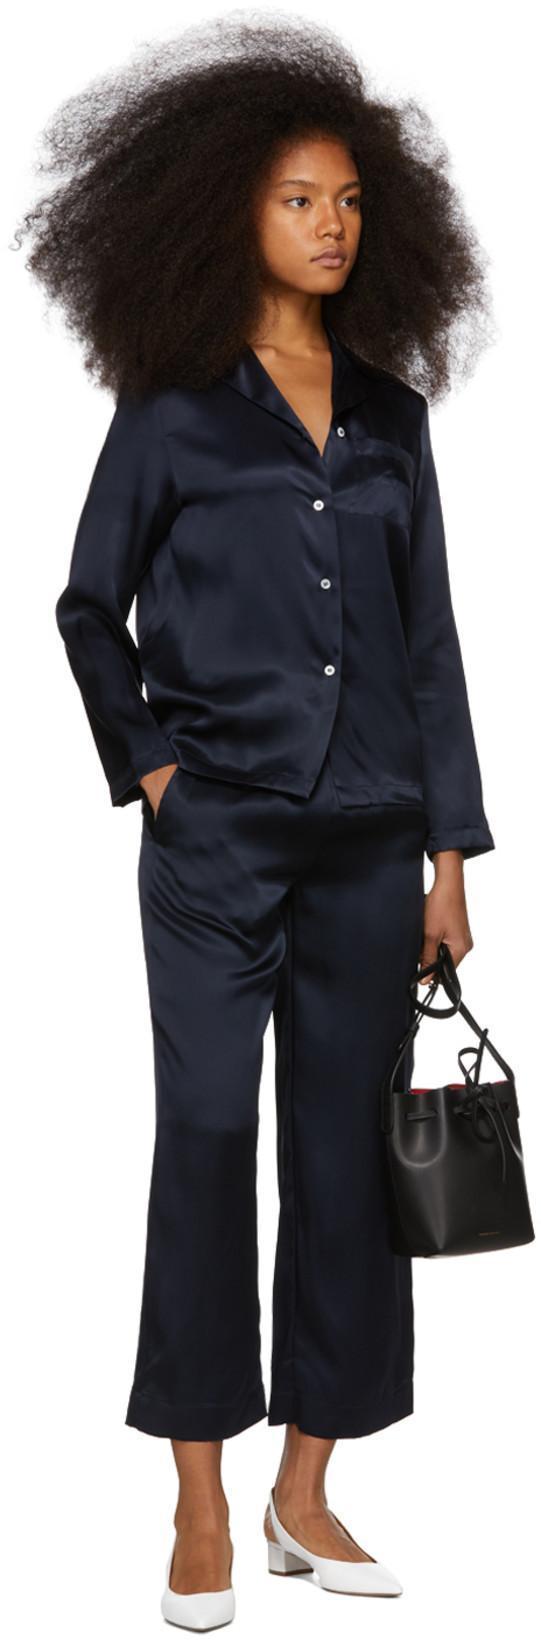 2f41be14f1468 MANSUR GAVRIEL Mansur Gavriel Navy Silk Flowy Pajama Shirt in Blu